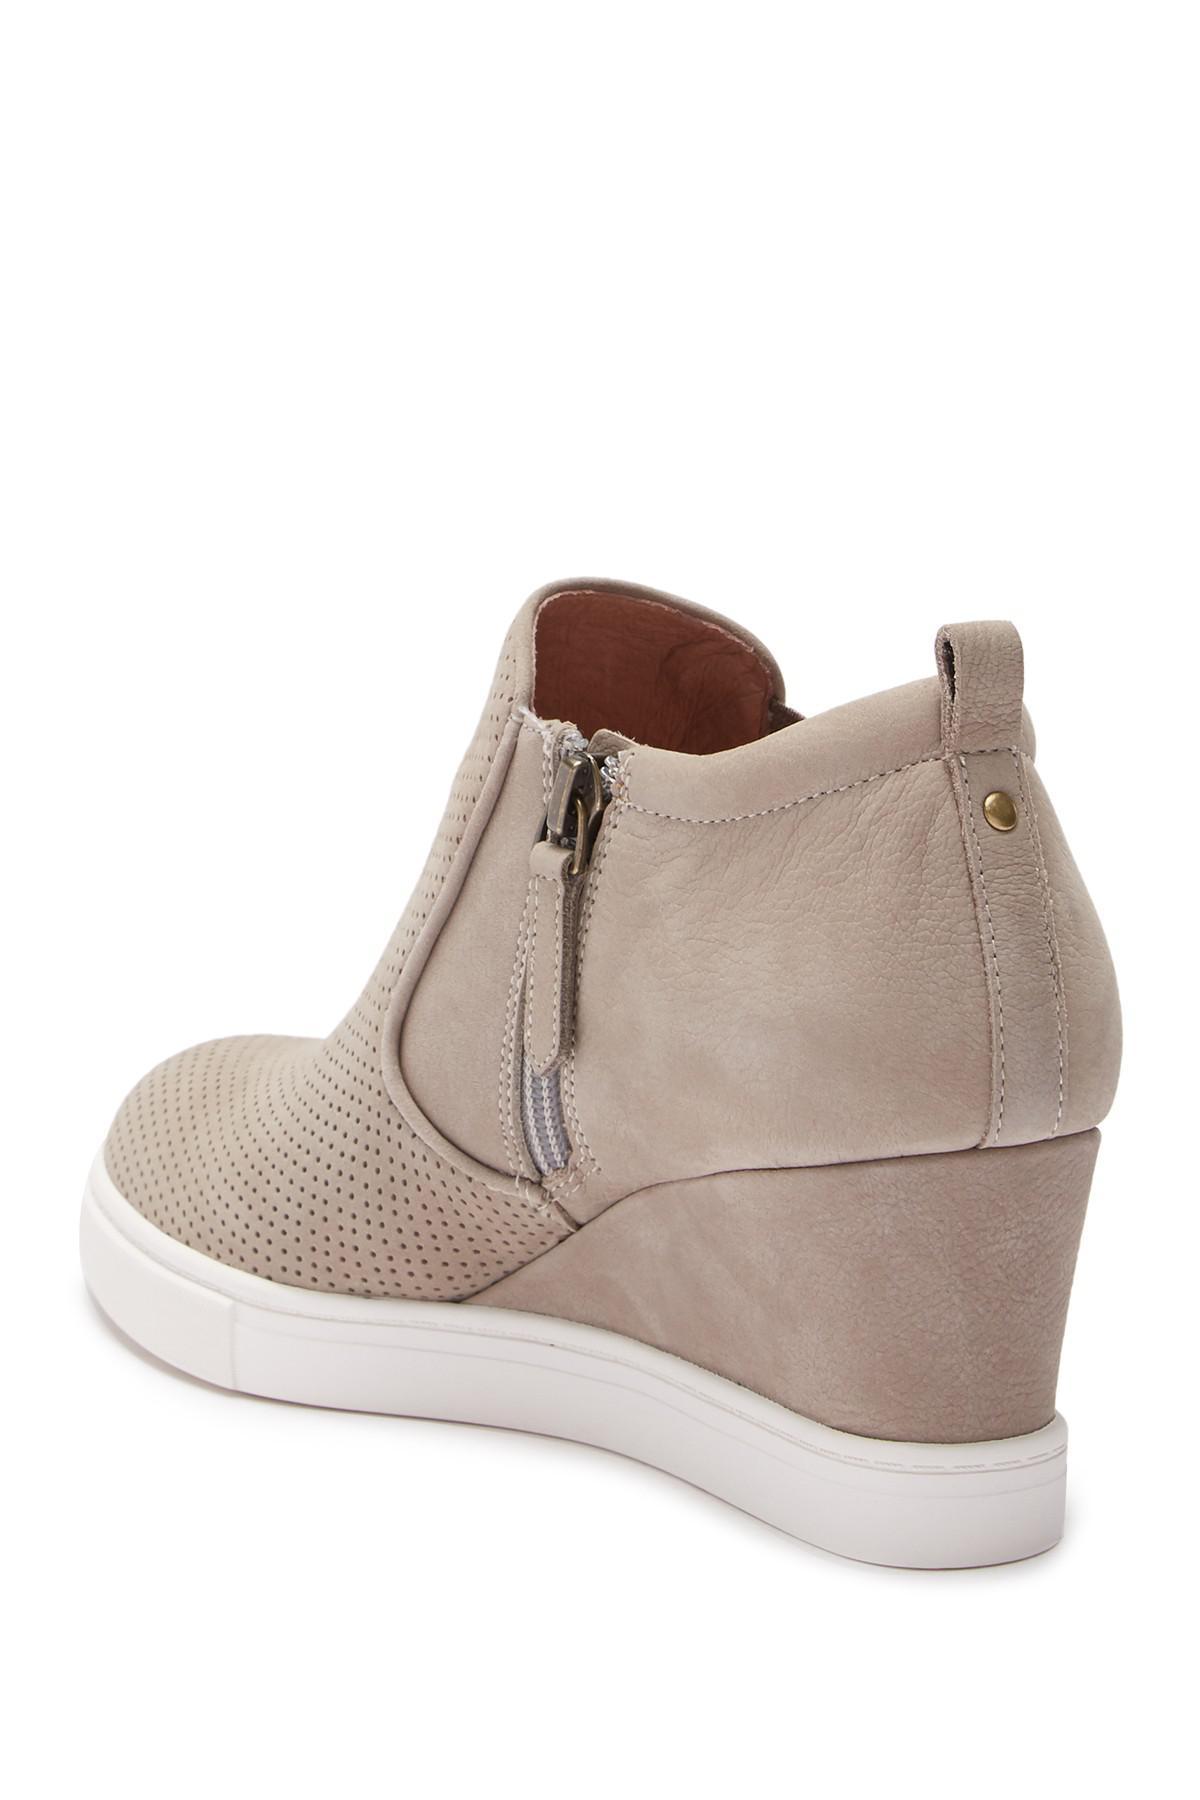 90bca902644 Caslon - Brown (r) Aiden Wedge Sneaker (women) - Lyst. View fullscreen